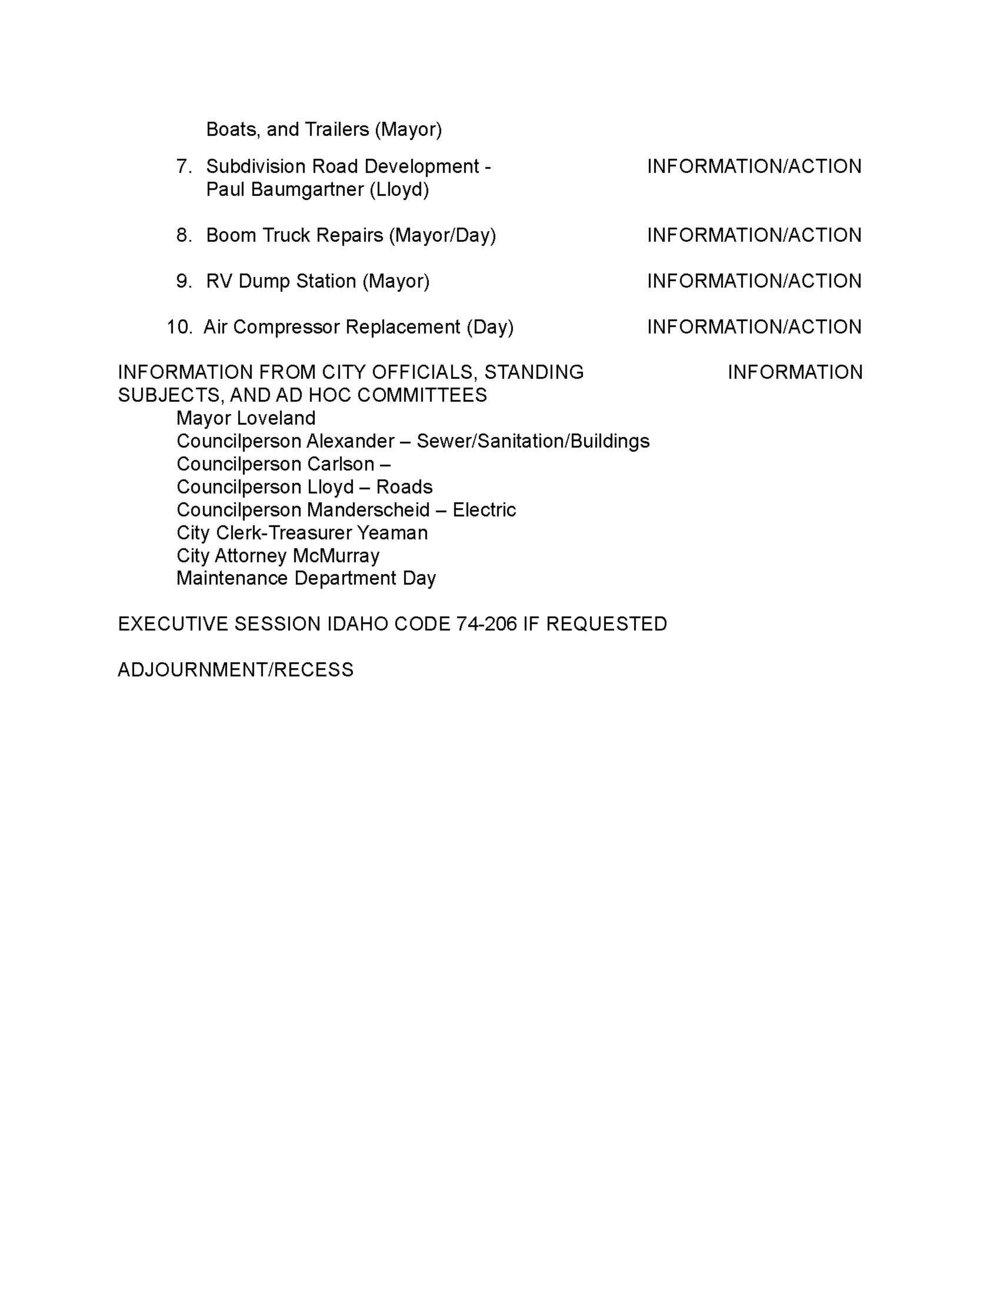 Agenda 01.08_Page_2.jpg